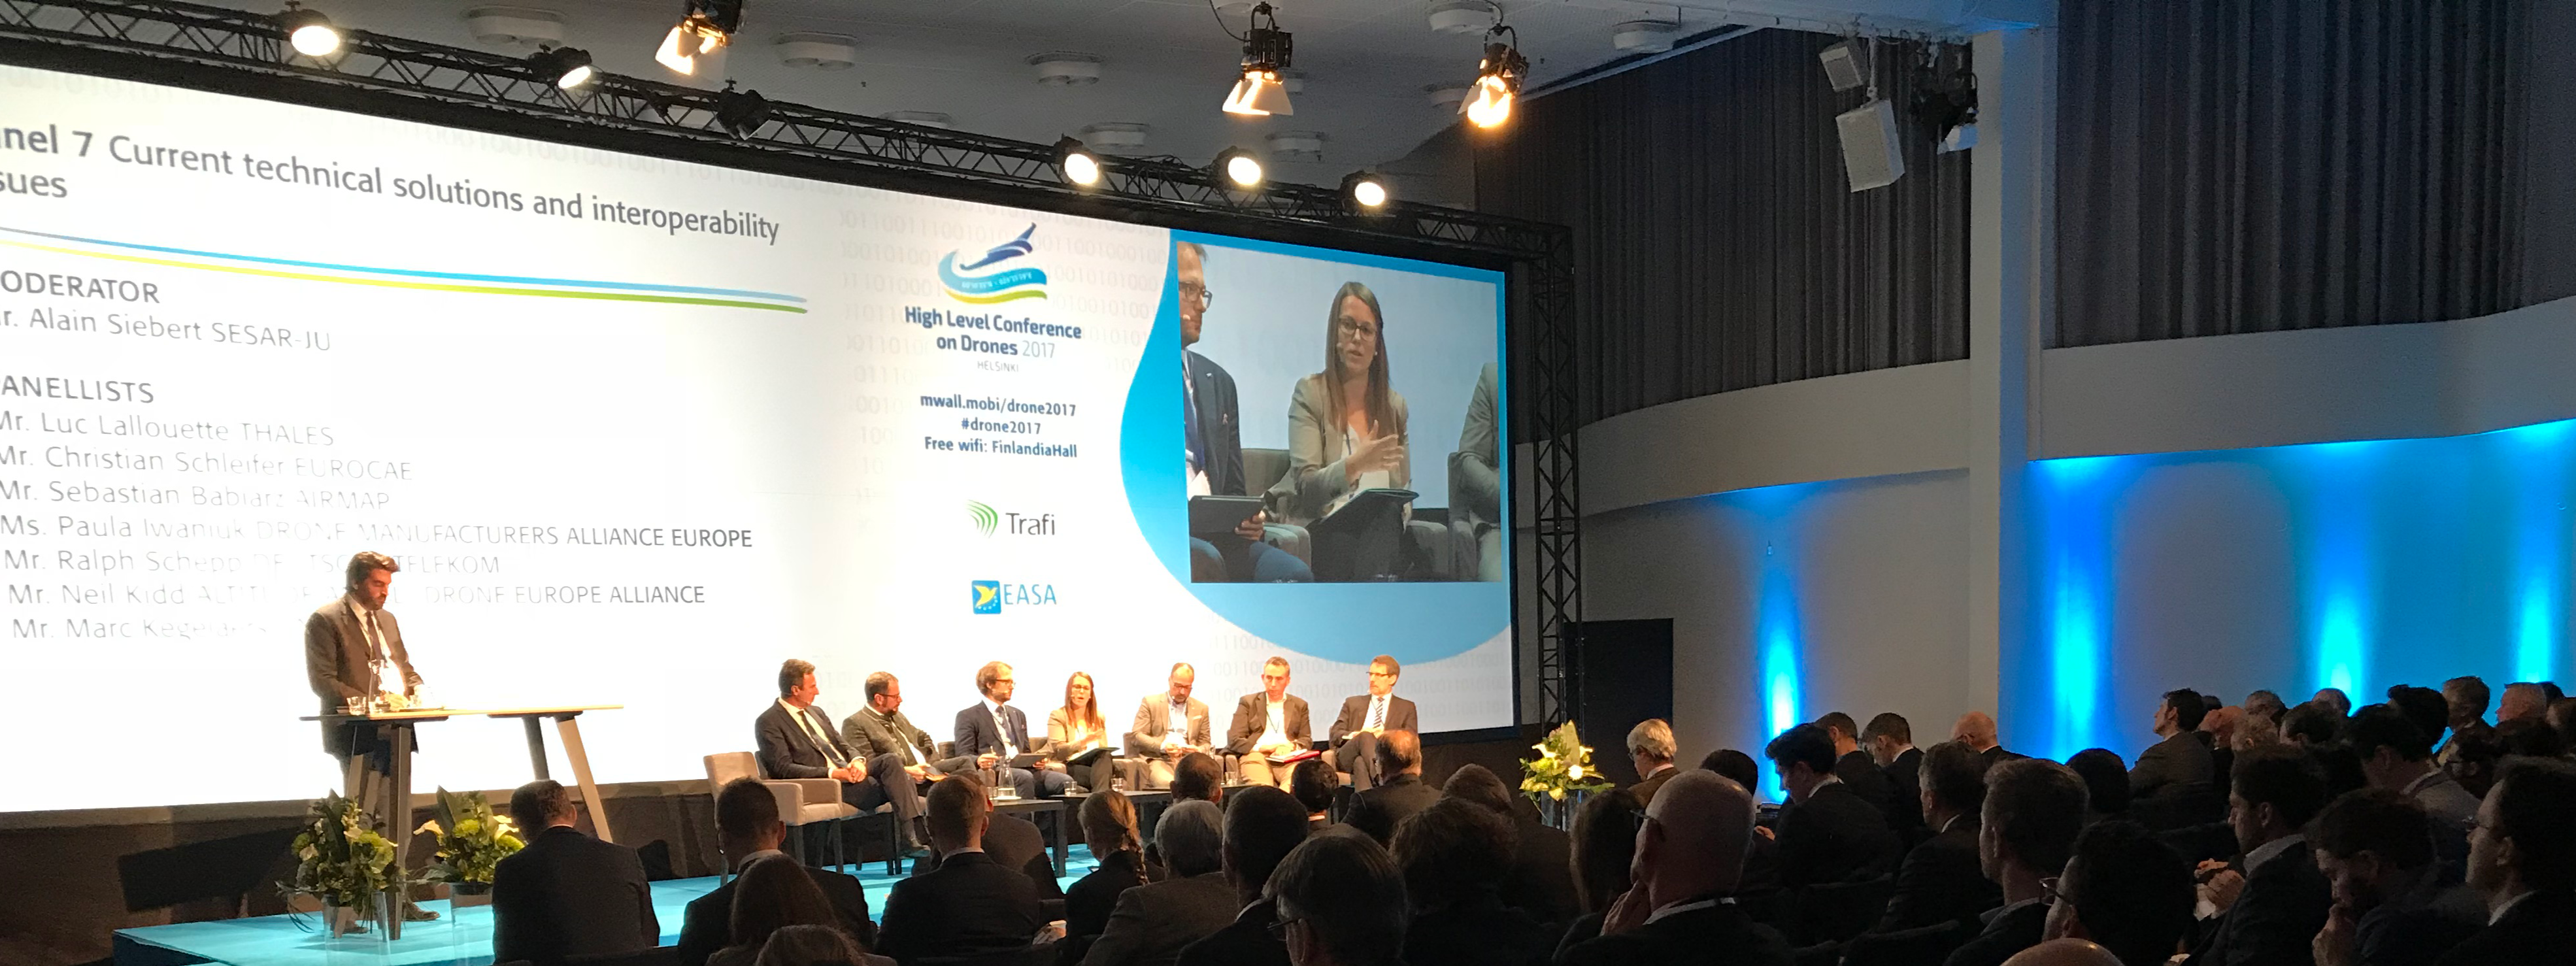 drones-event-tapahtuma-lavalla-konferenssin-panelistit